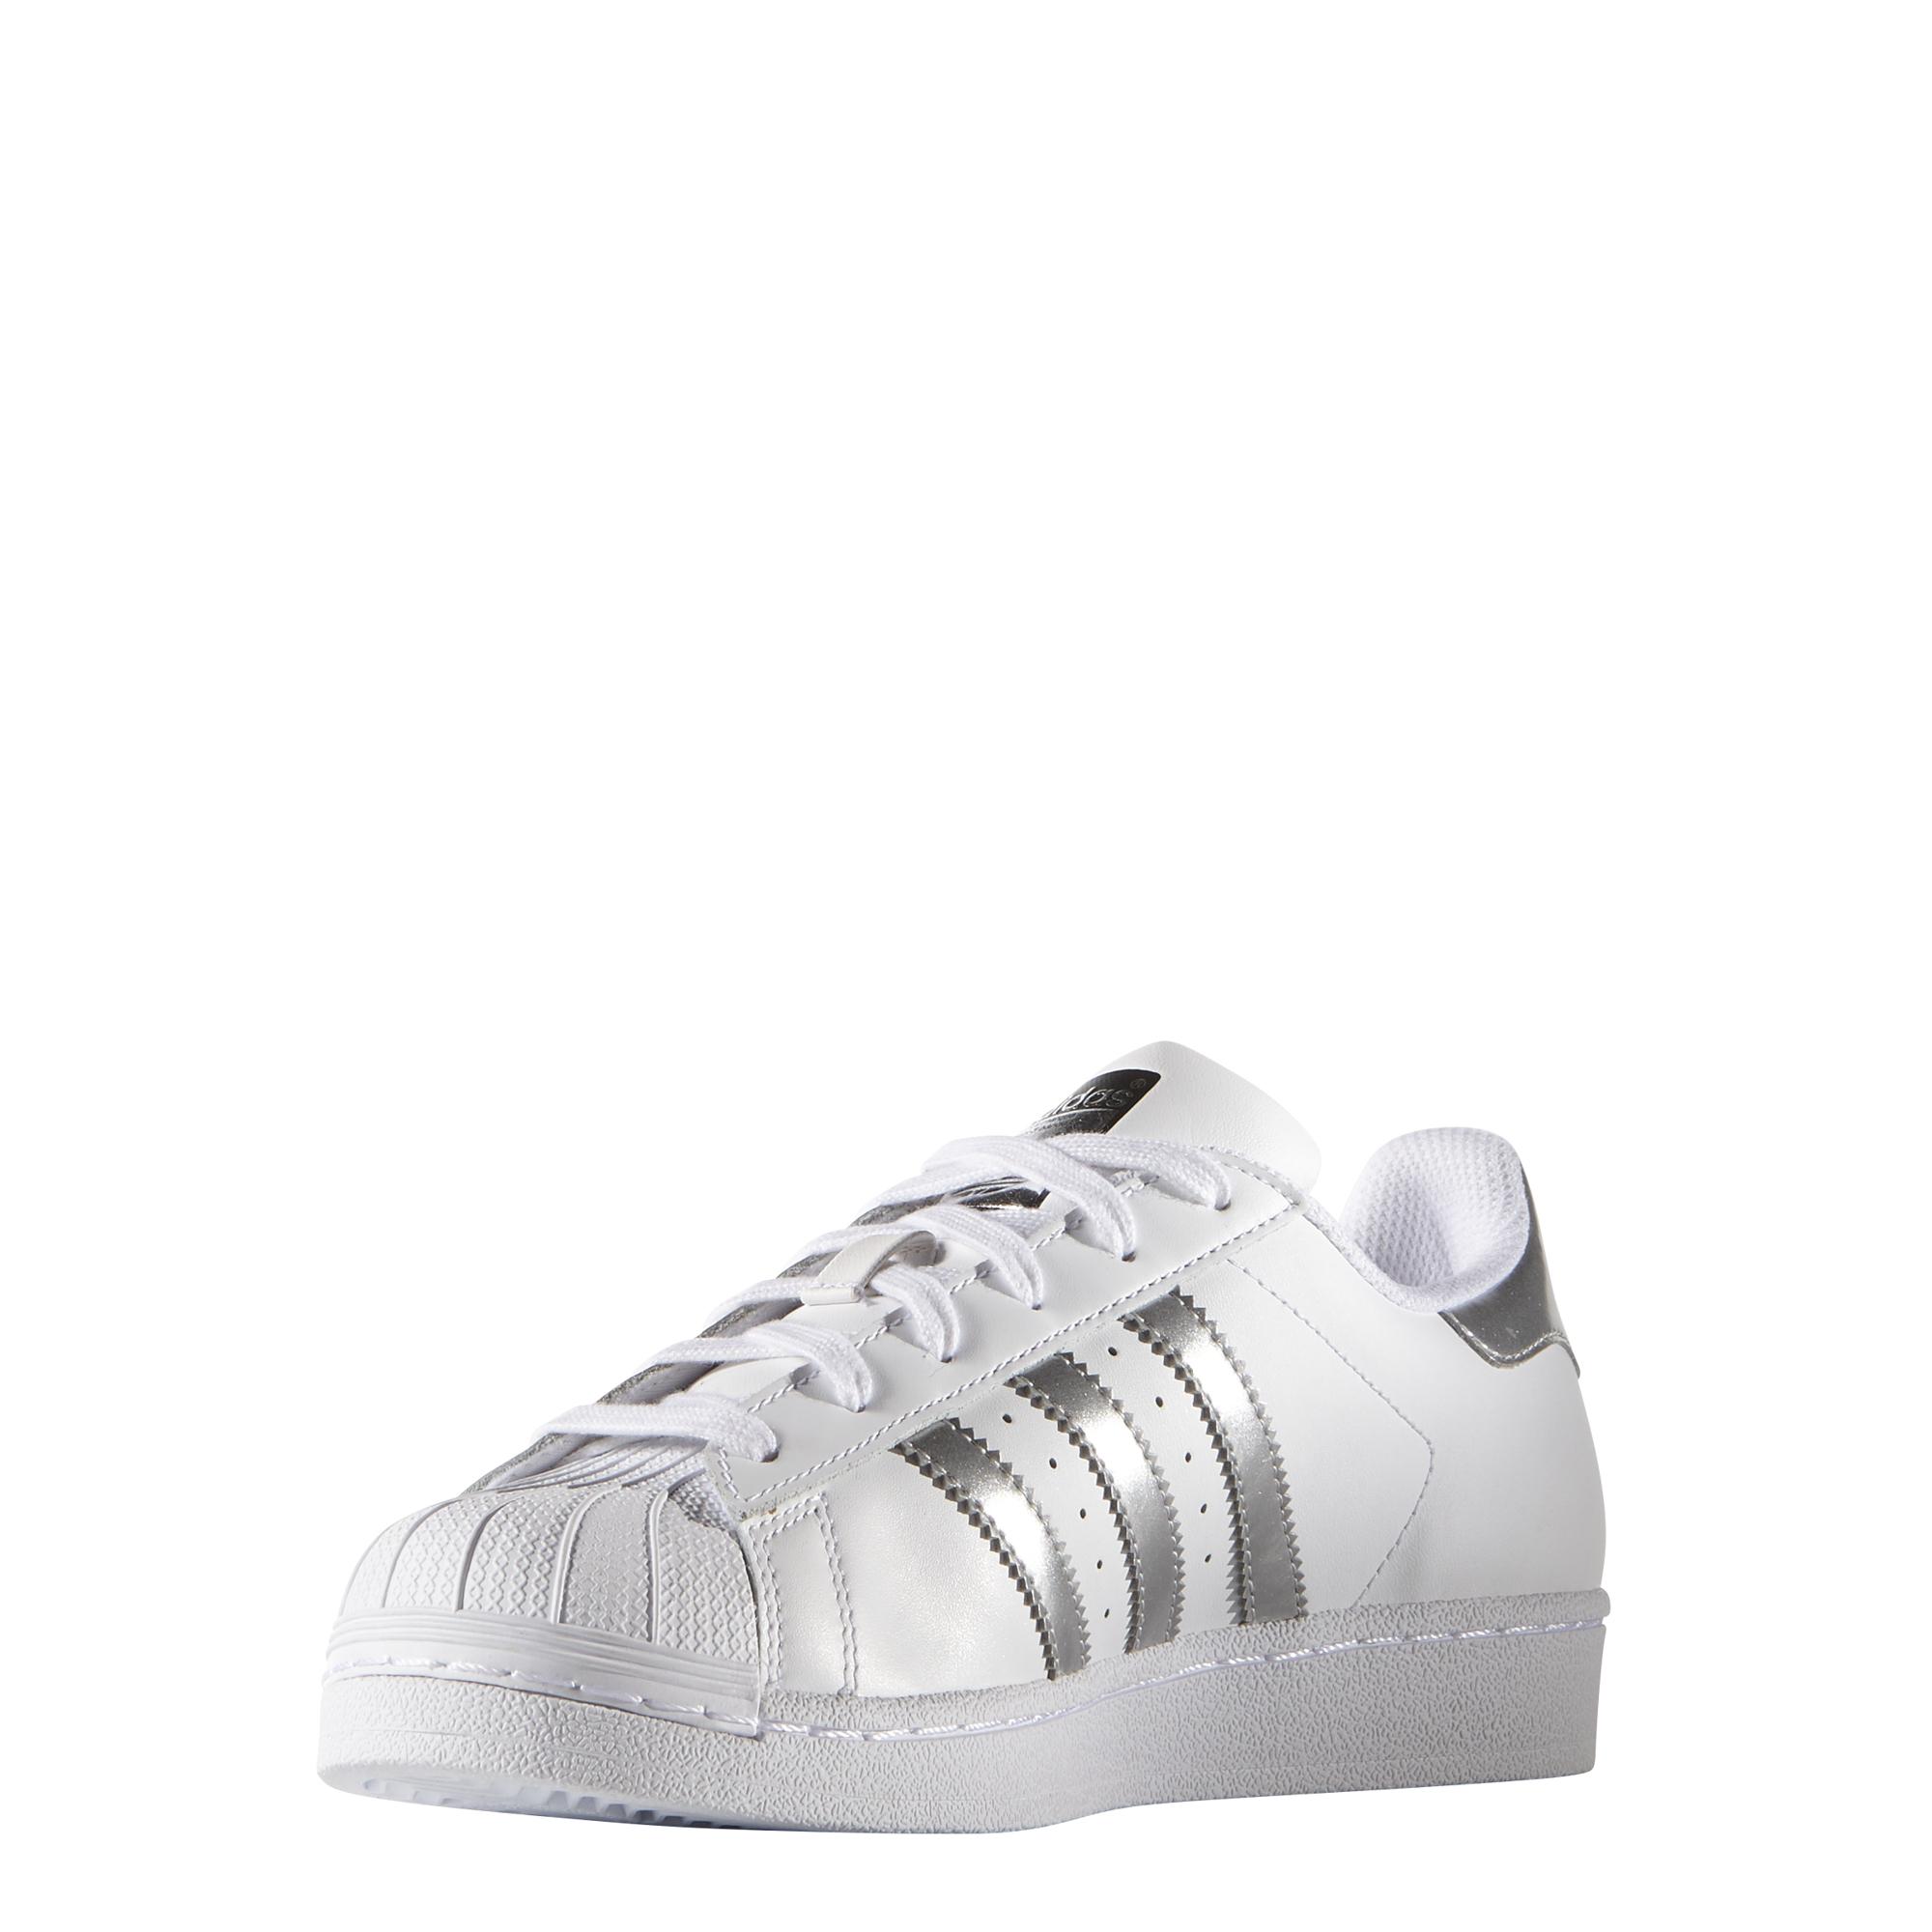 meilleur authentique 8f362 5b9c3 Chaussures femme adidas Superstar